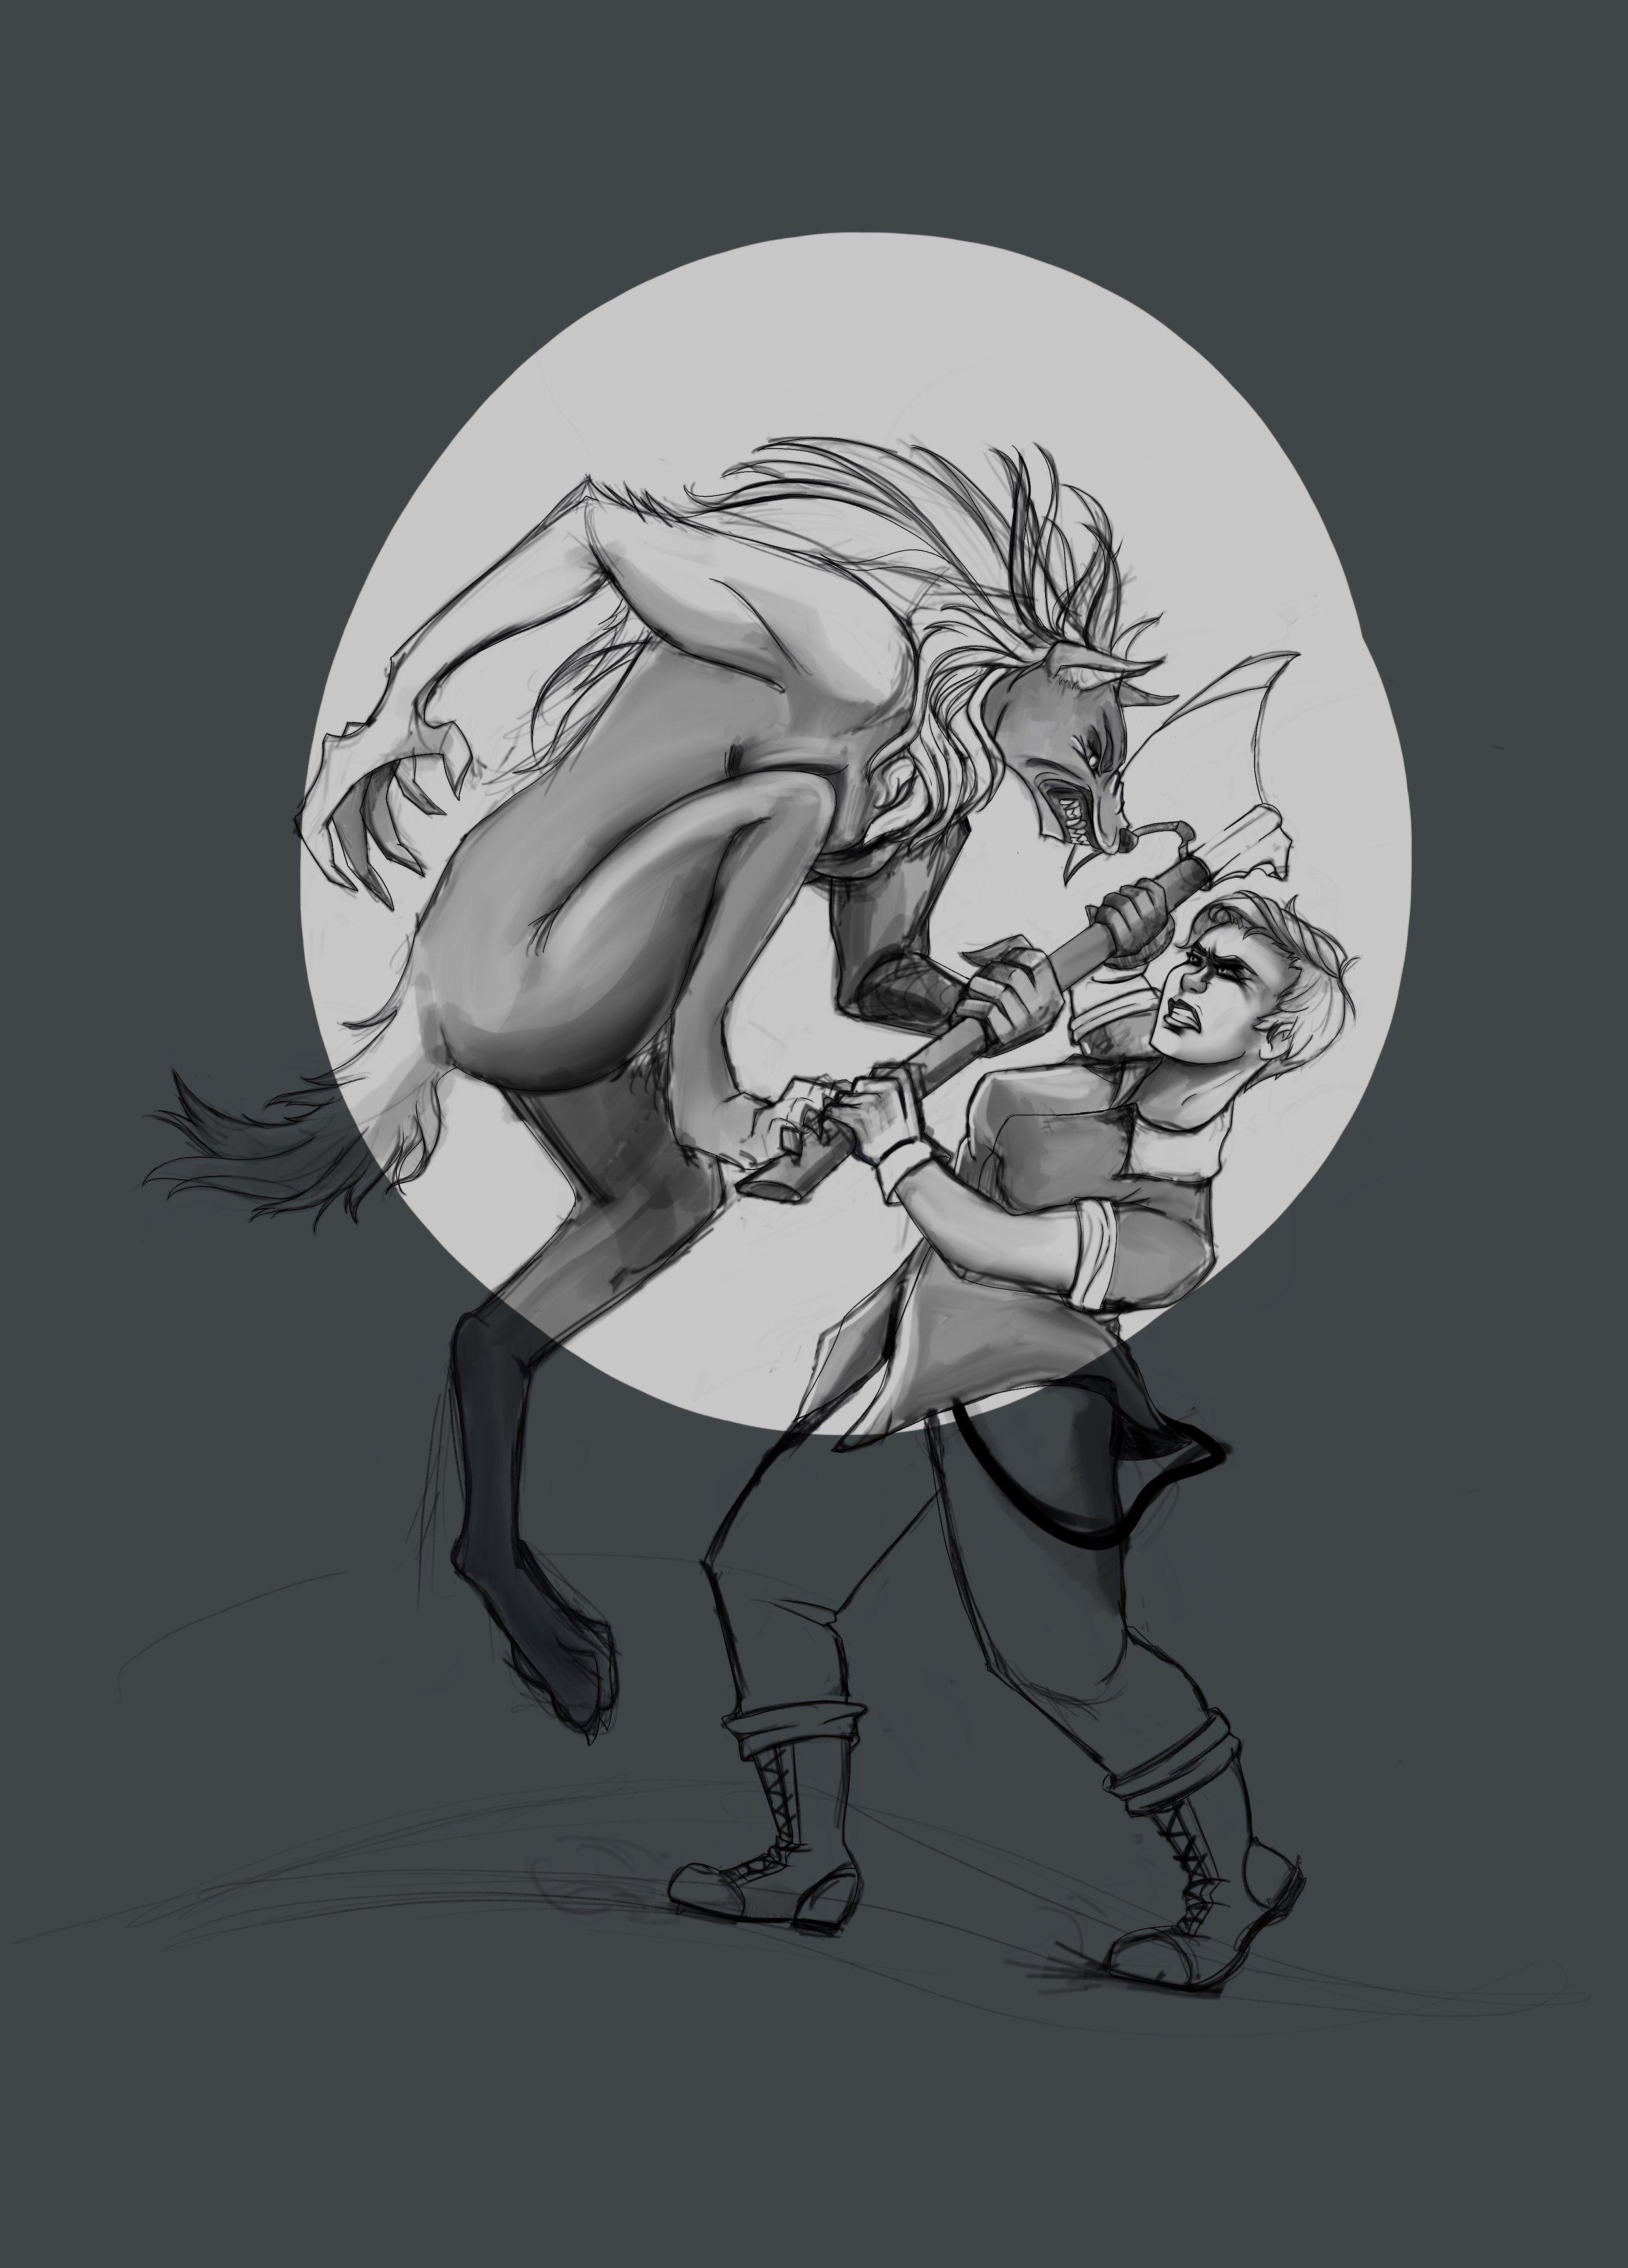 Monster_And_Maiden_Part_1.jpg